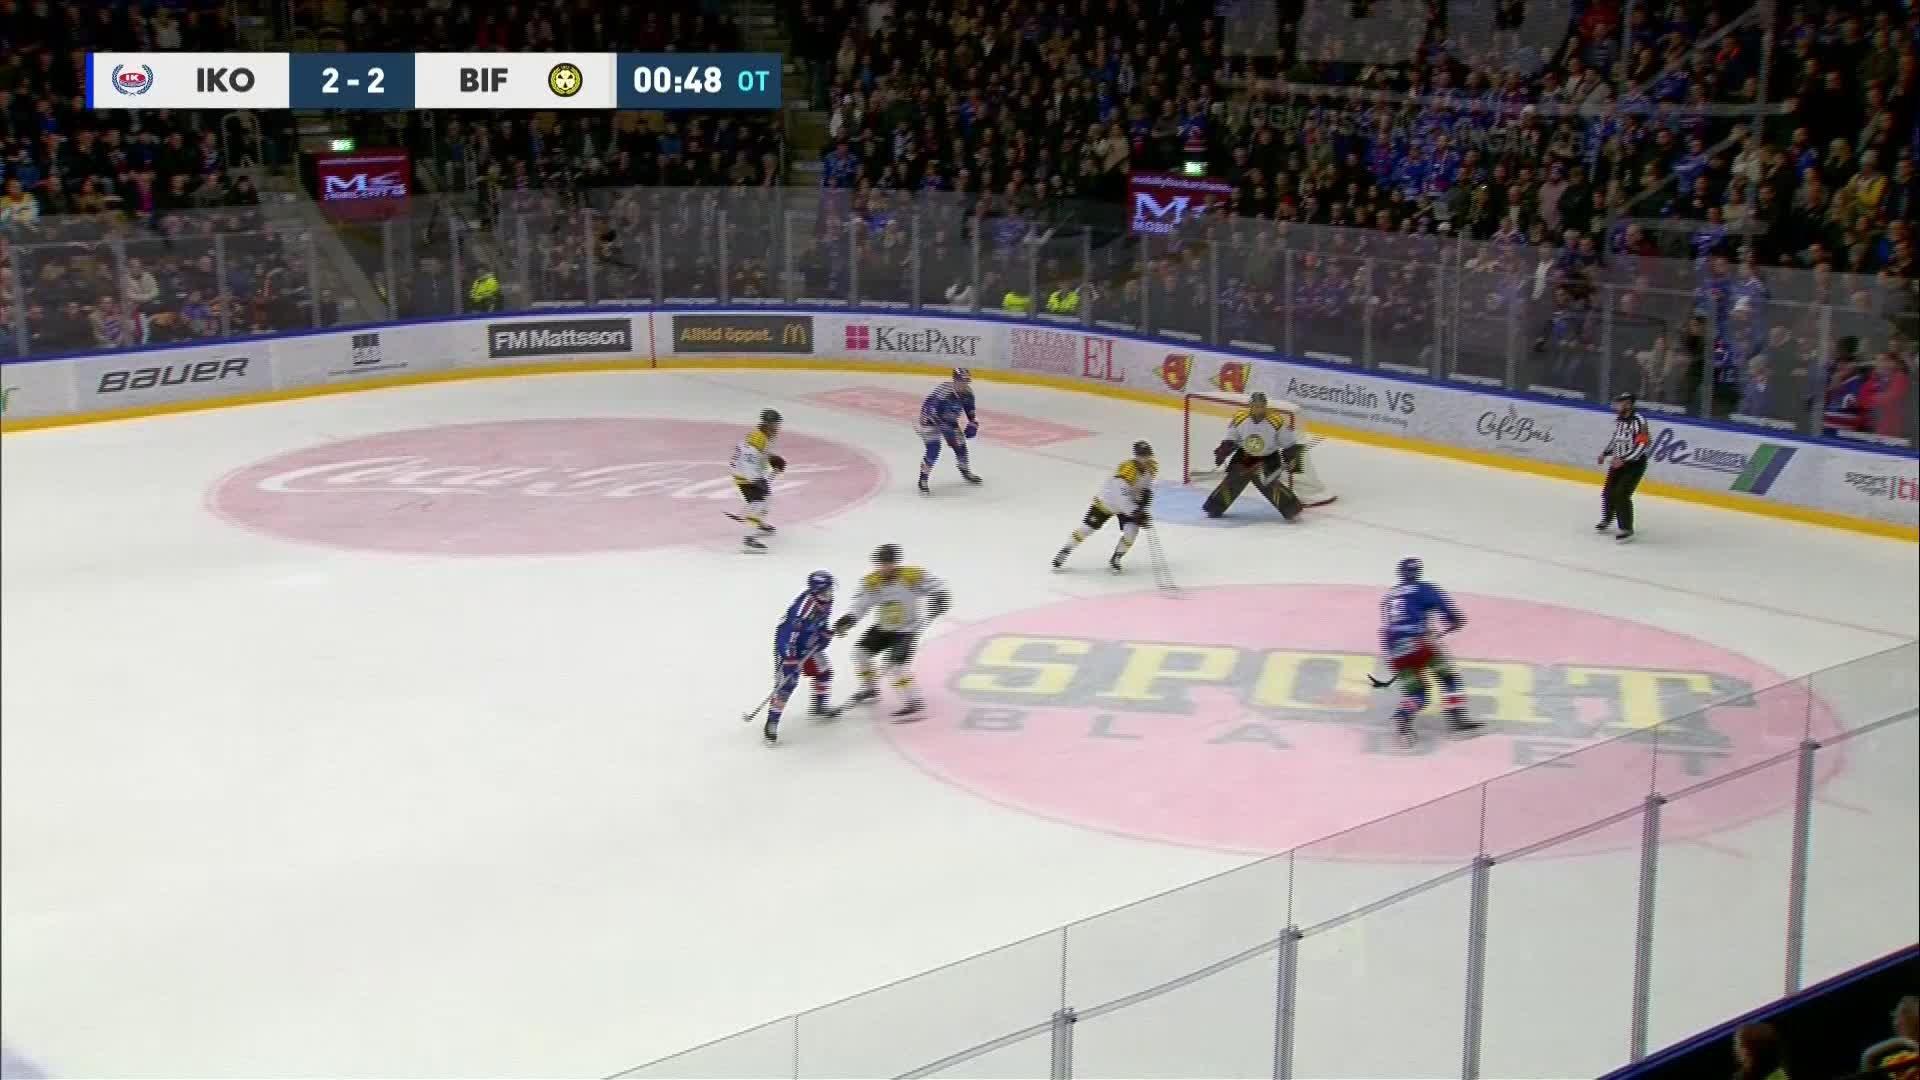 IK Oskarshamn - Brynäs IF 3-2